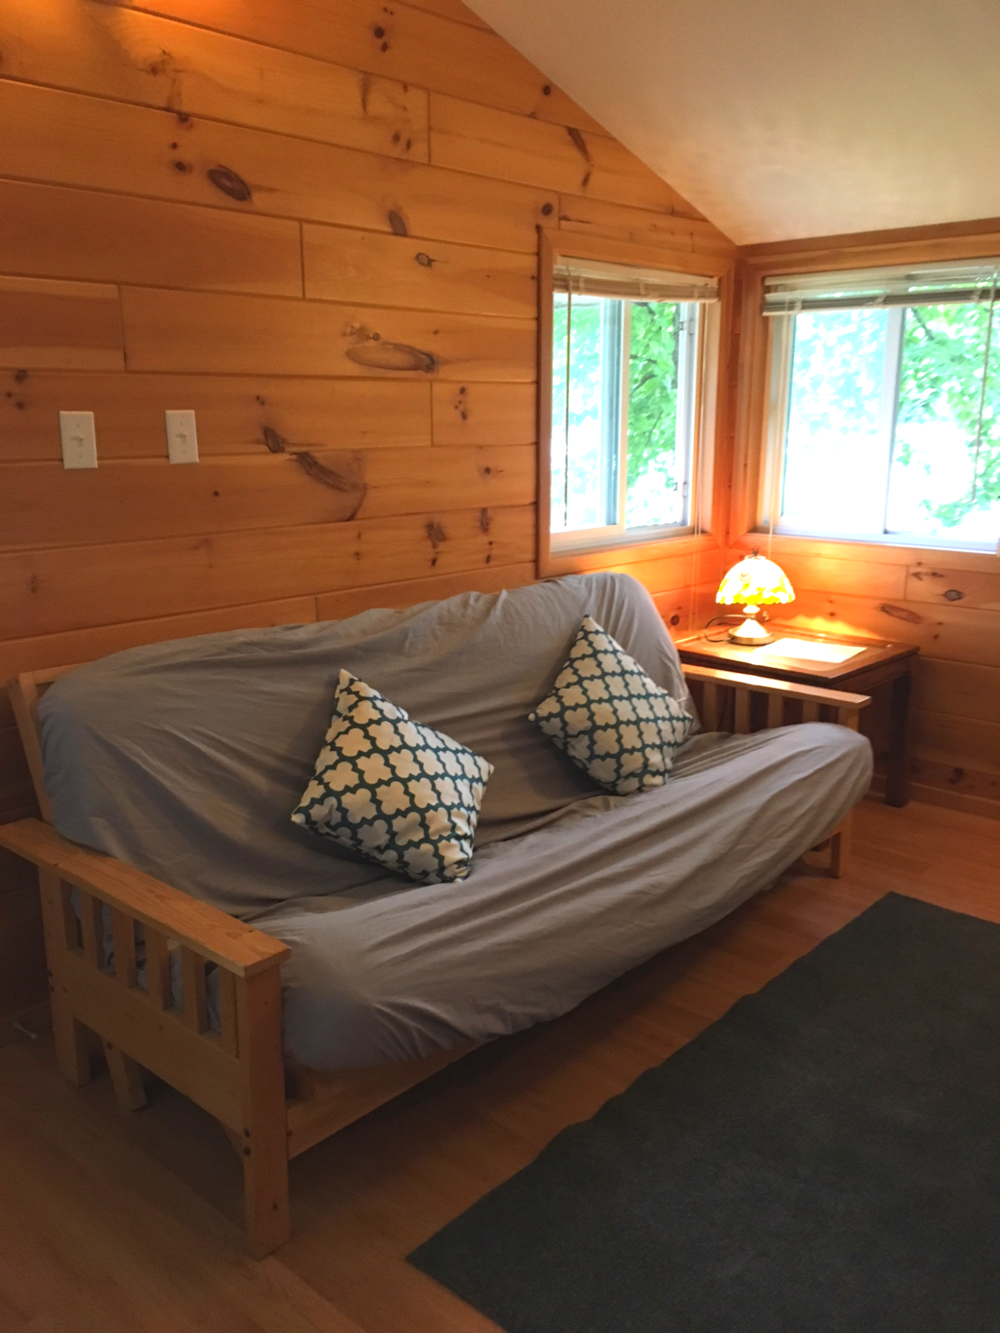 2 Bedroom Max capacityfor two bedrooms 4 (+1)    Summer Season  2 Nights Package: $375 Additional Nights: $160 Long Weekends (3 nights minimum) : $550  Weekly Rate (7 days) : $1050